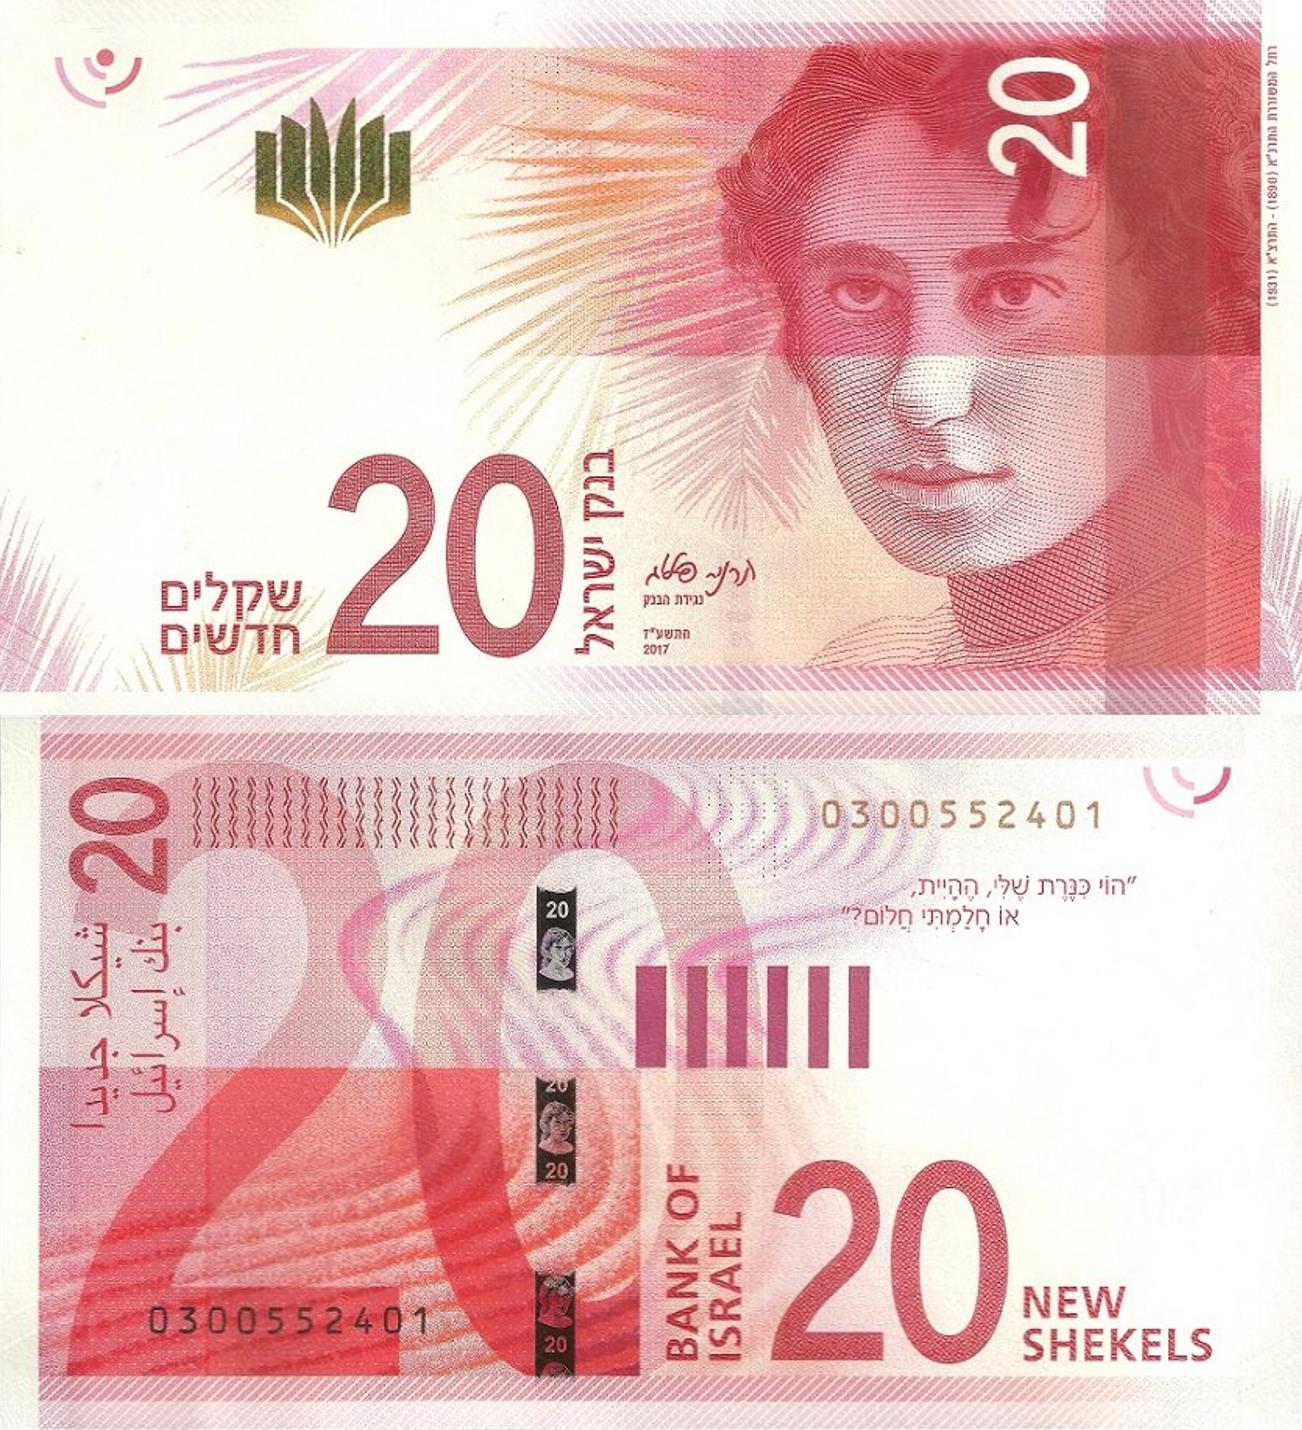 Israel Banknote Paper New Money Shekel Sheqalim 20